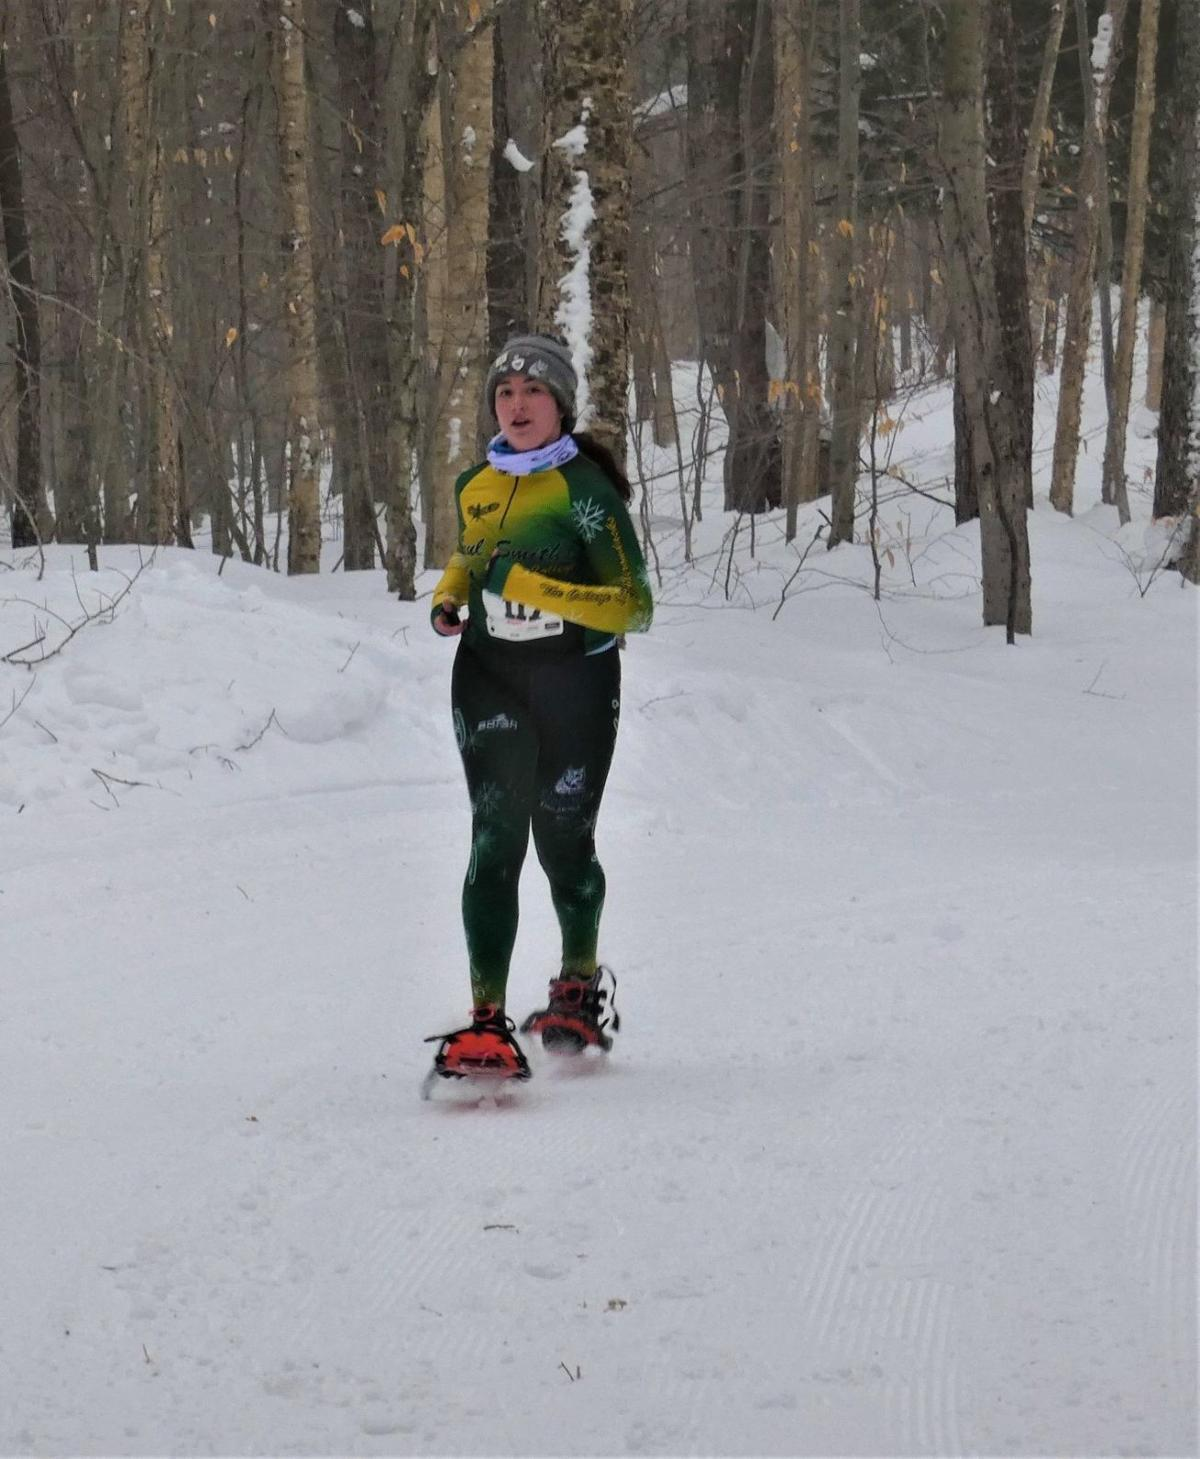 Snowshoe athlete Margret Montag